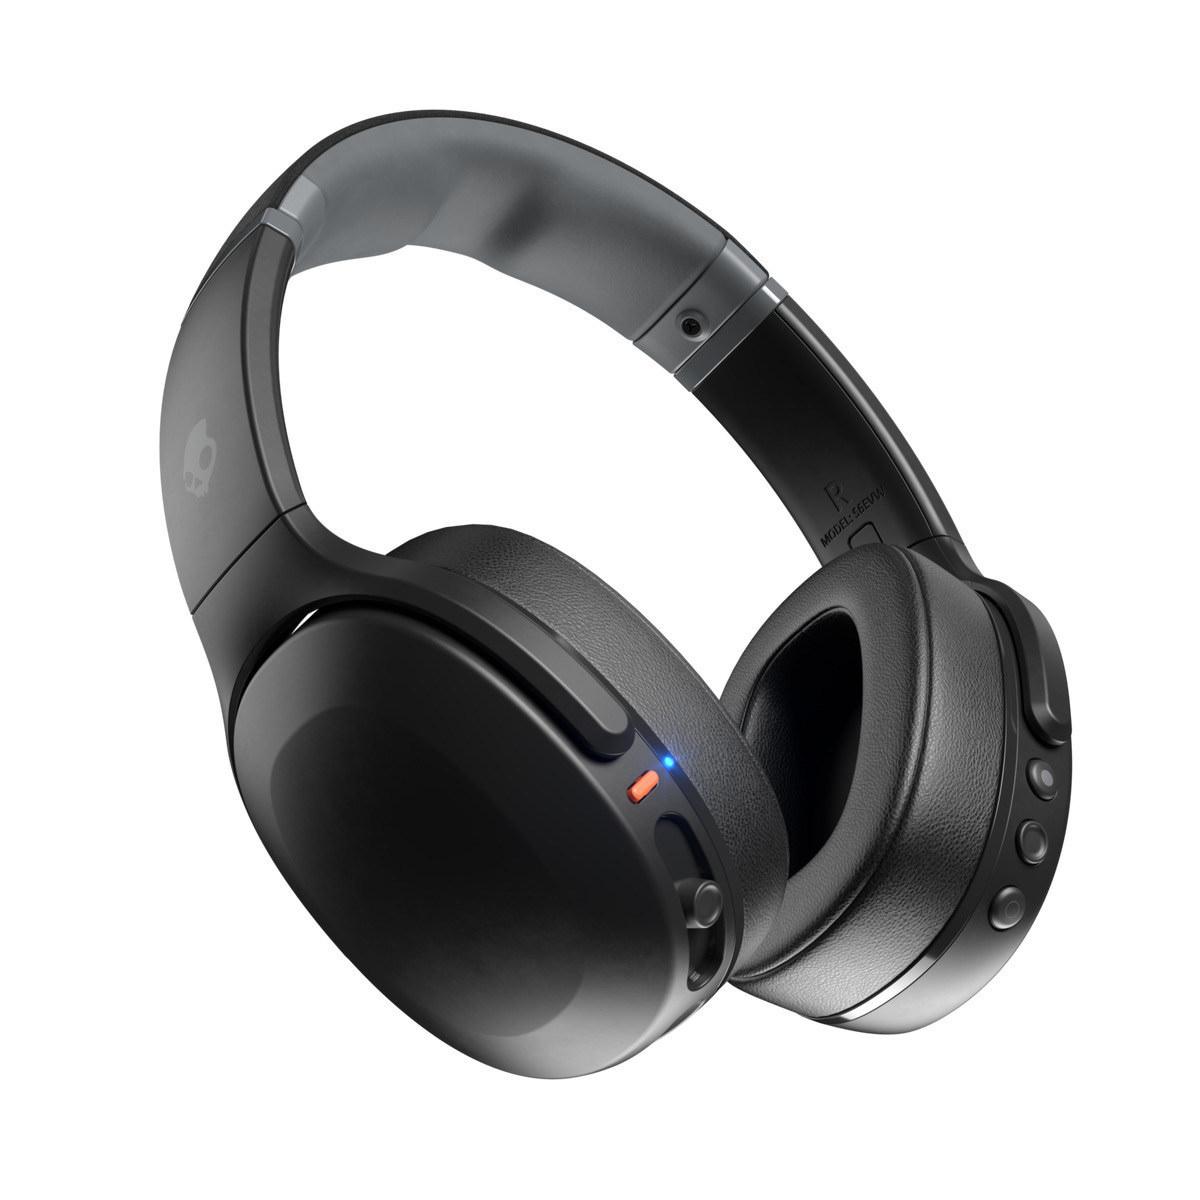 Skullcandy Crusher Evo Wireless Headphones in True Black